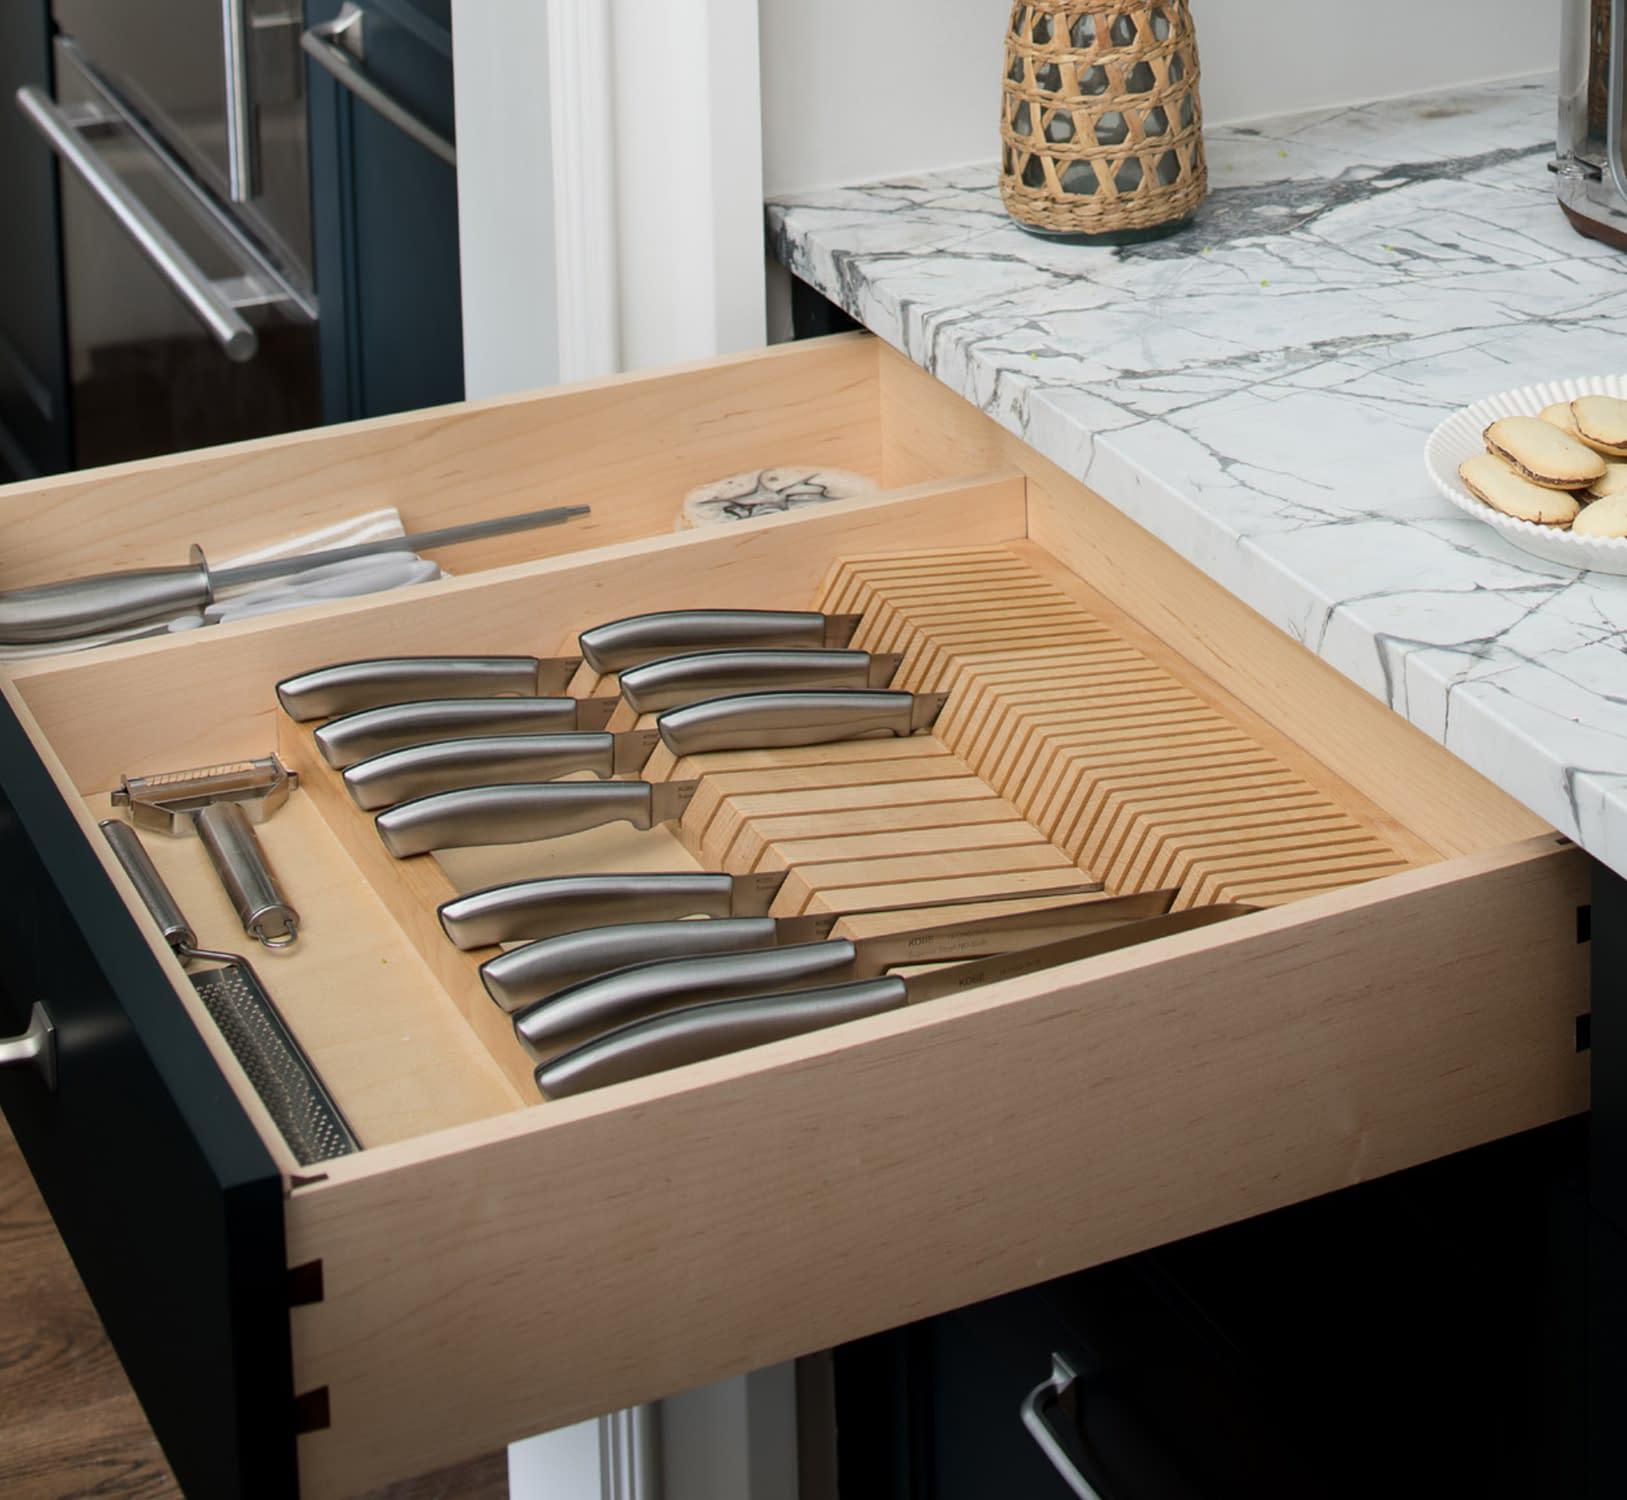 full knife set storage